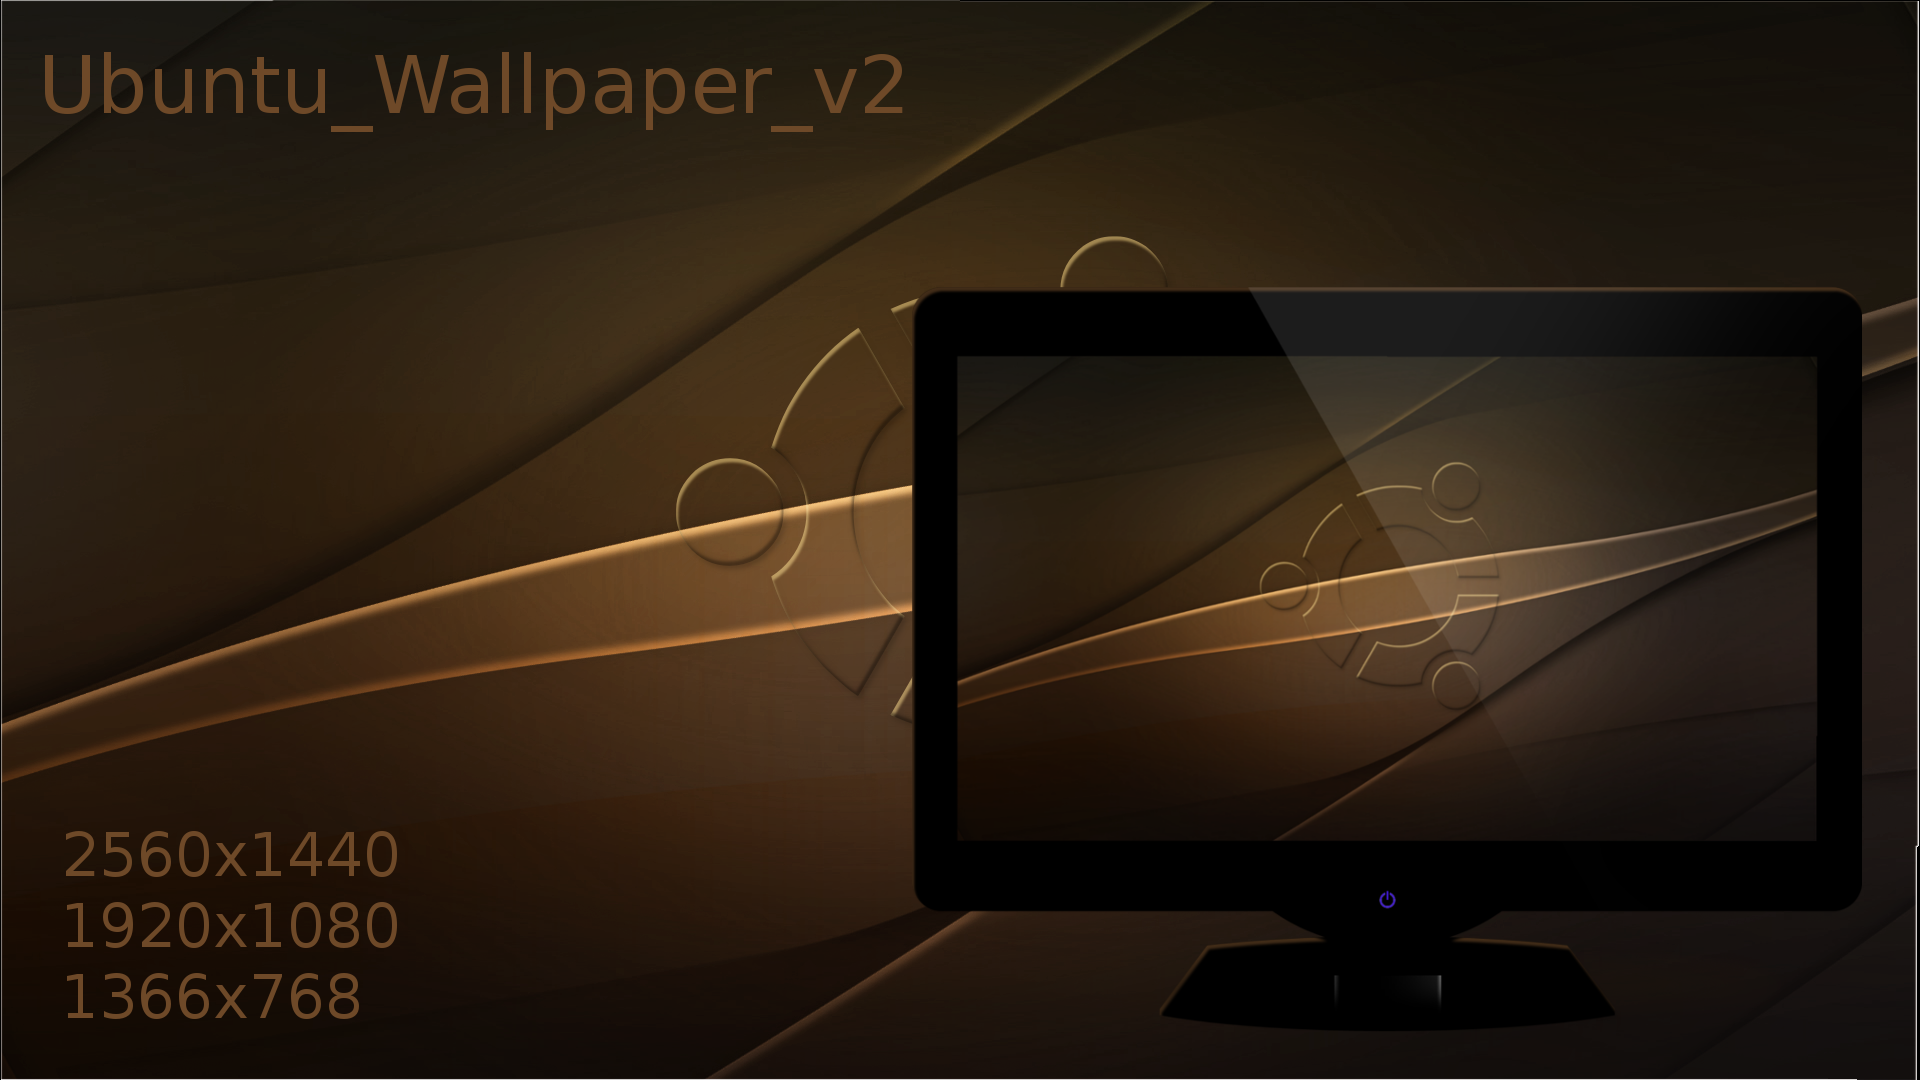 Ubuntu_Wallpaper_v2